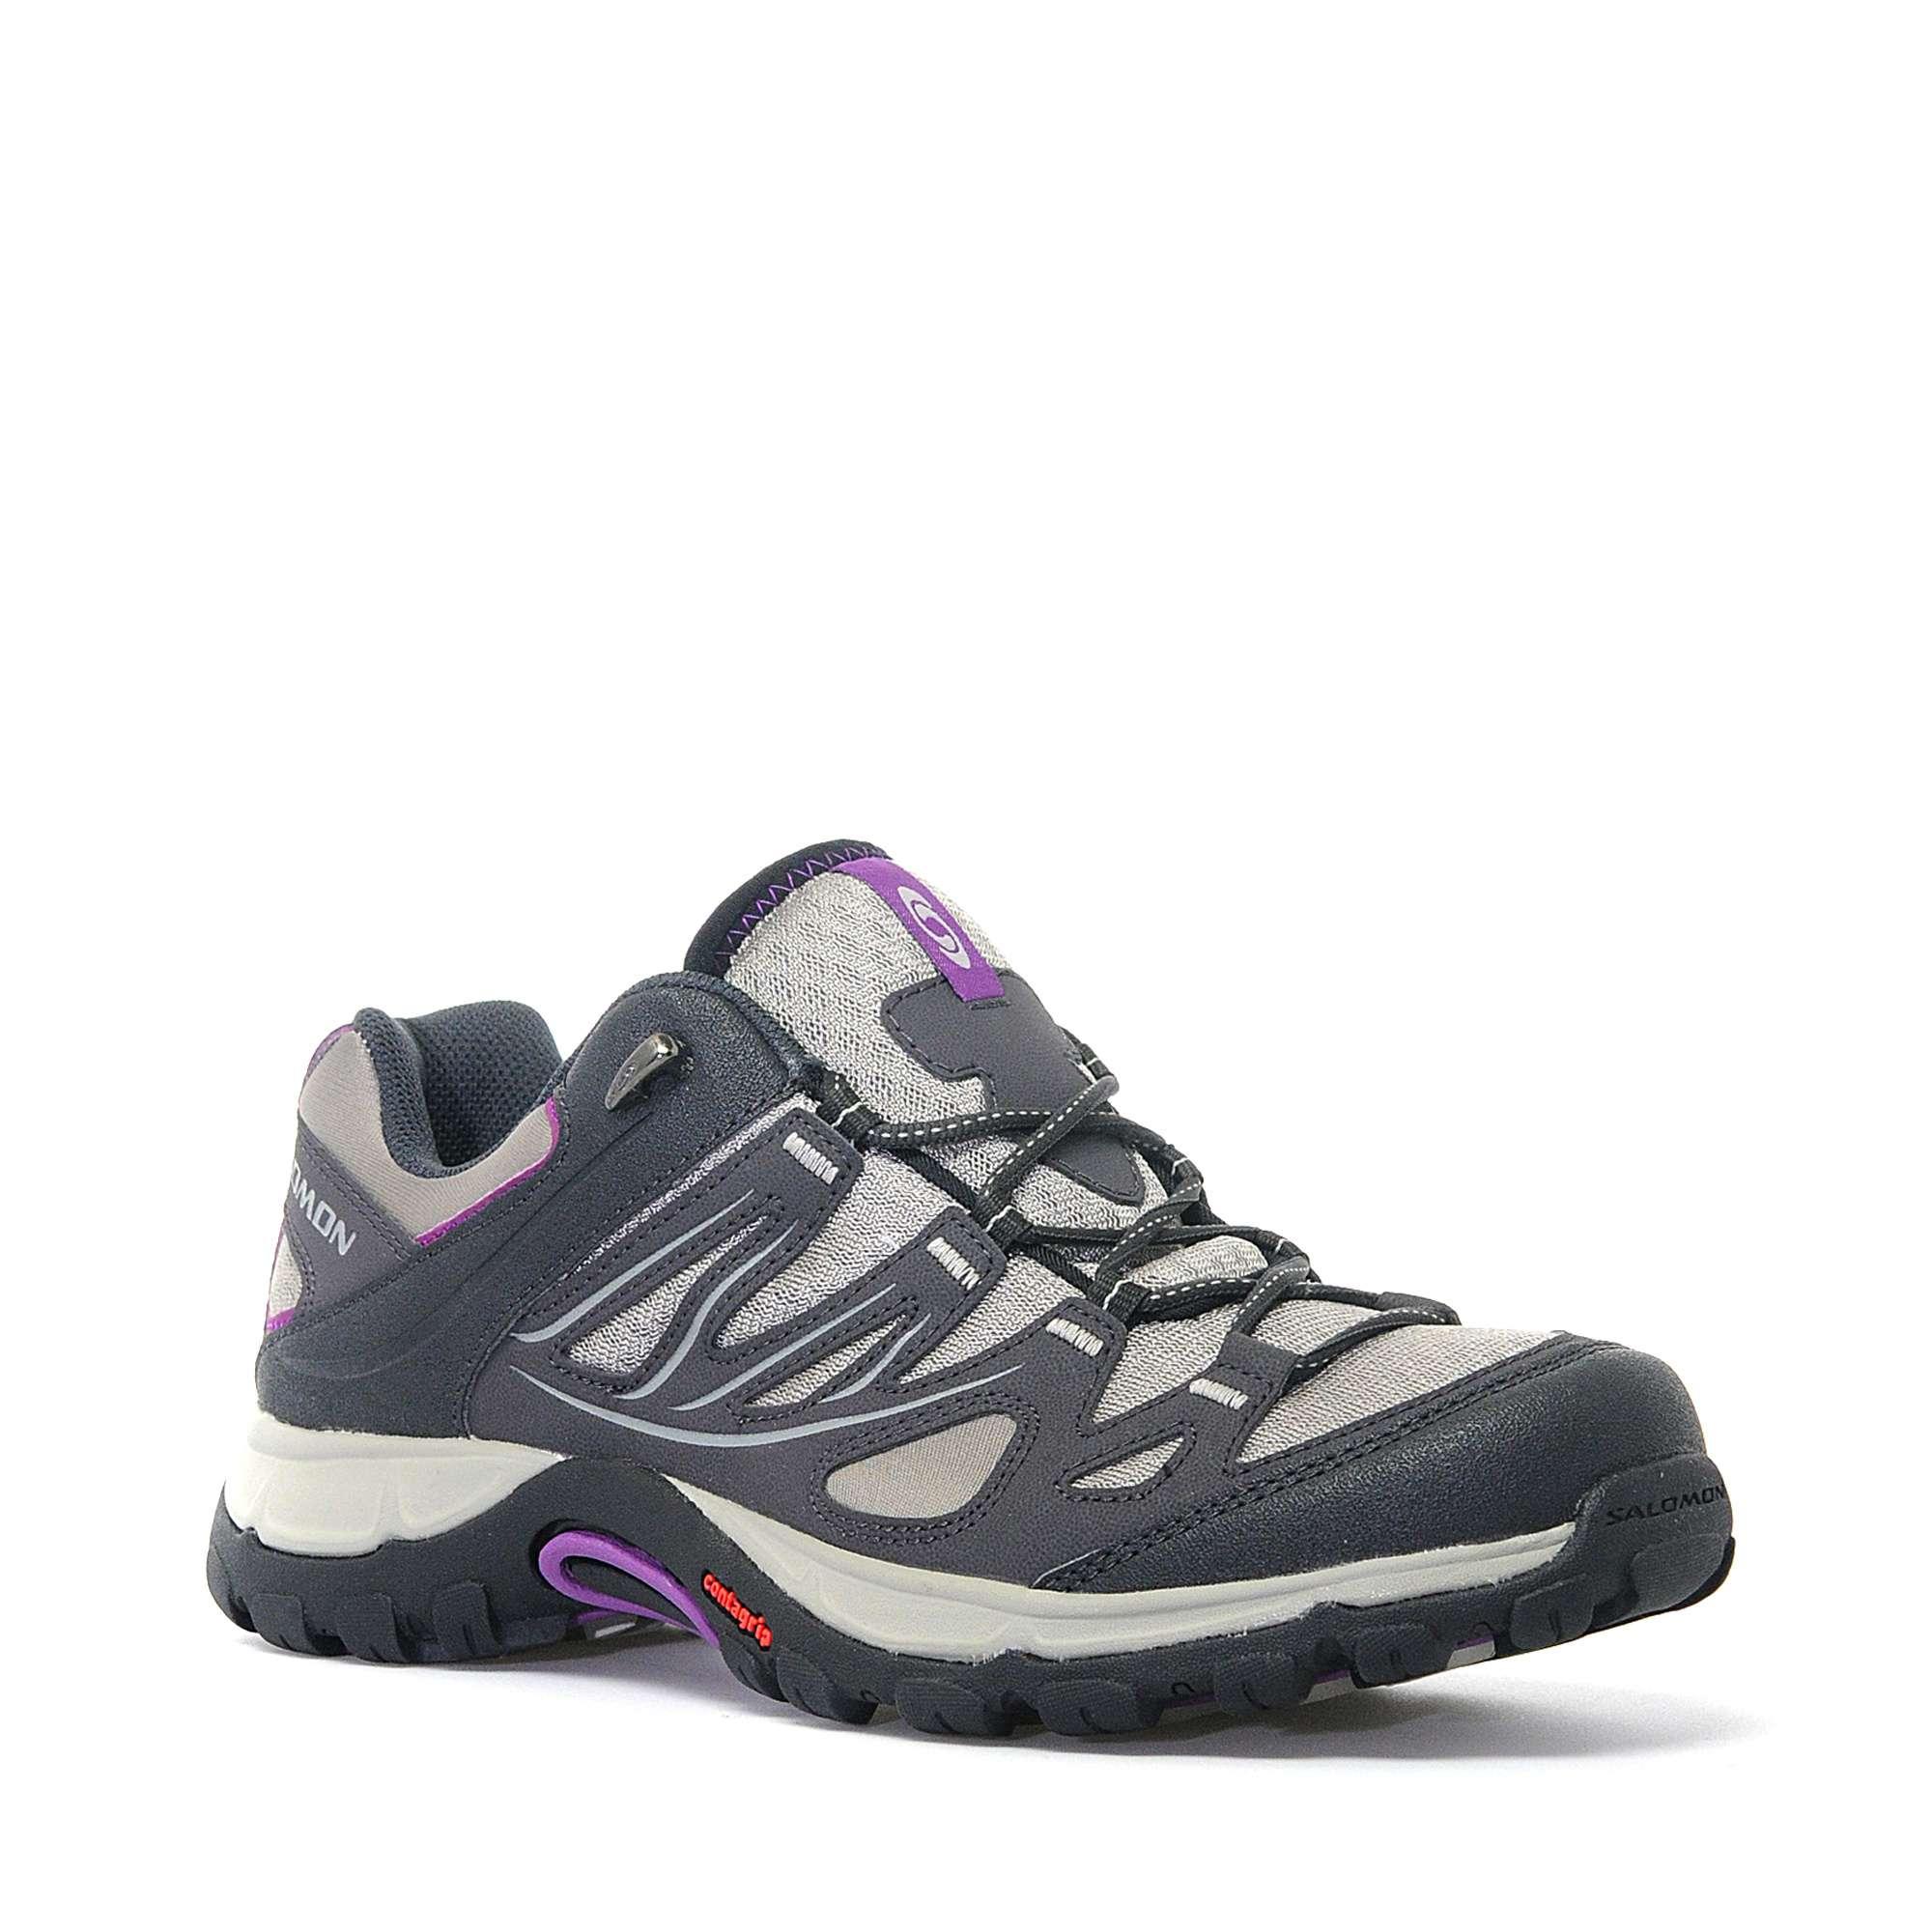 SALOMON Women's Ellipse Aero Walking Shoe